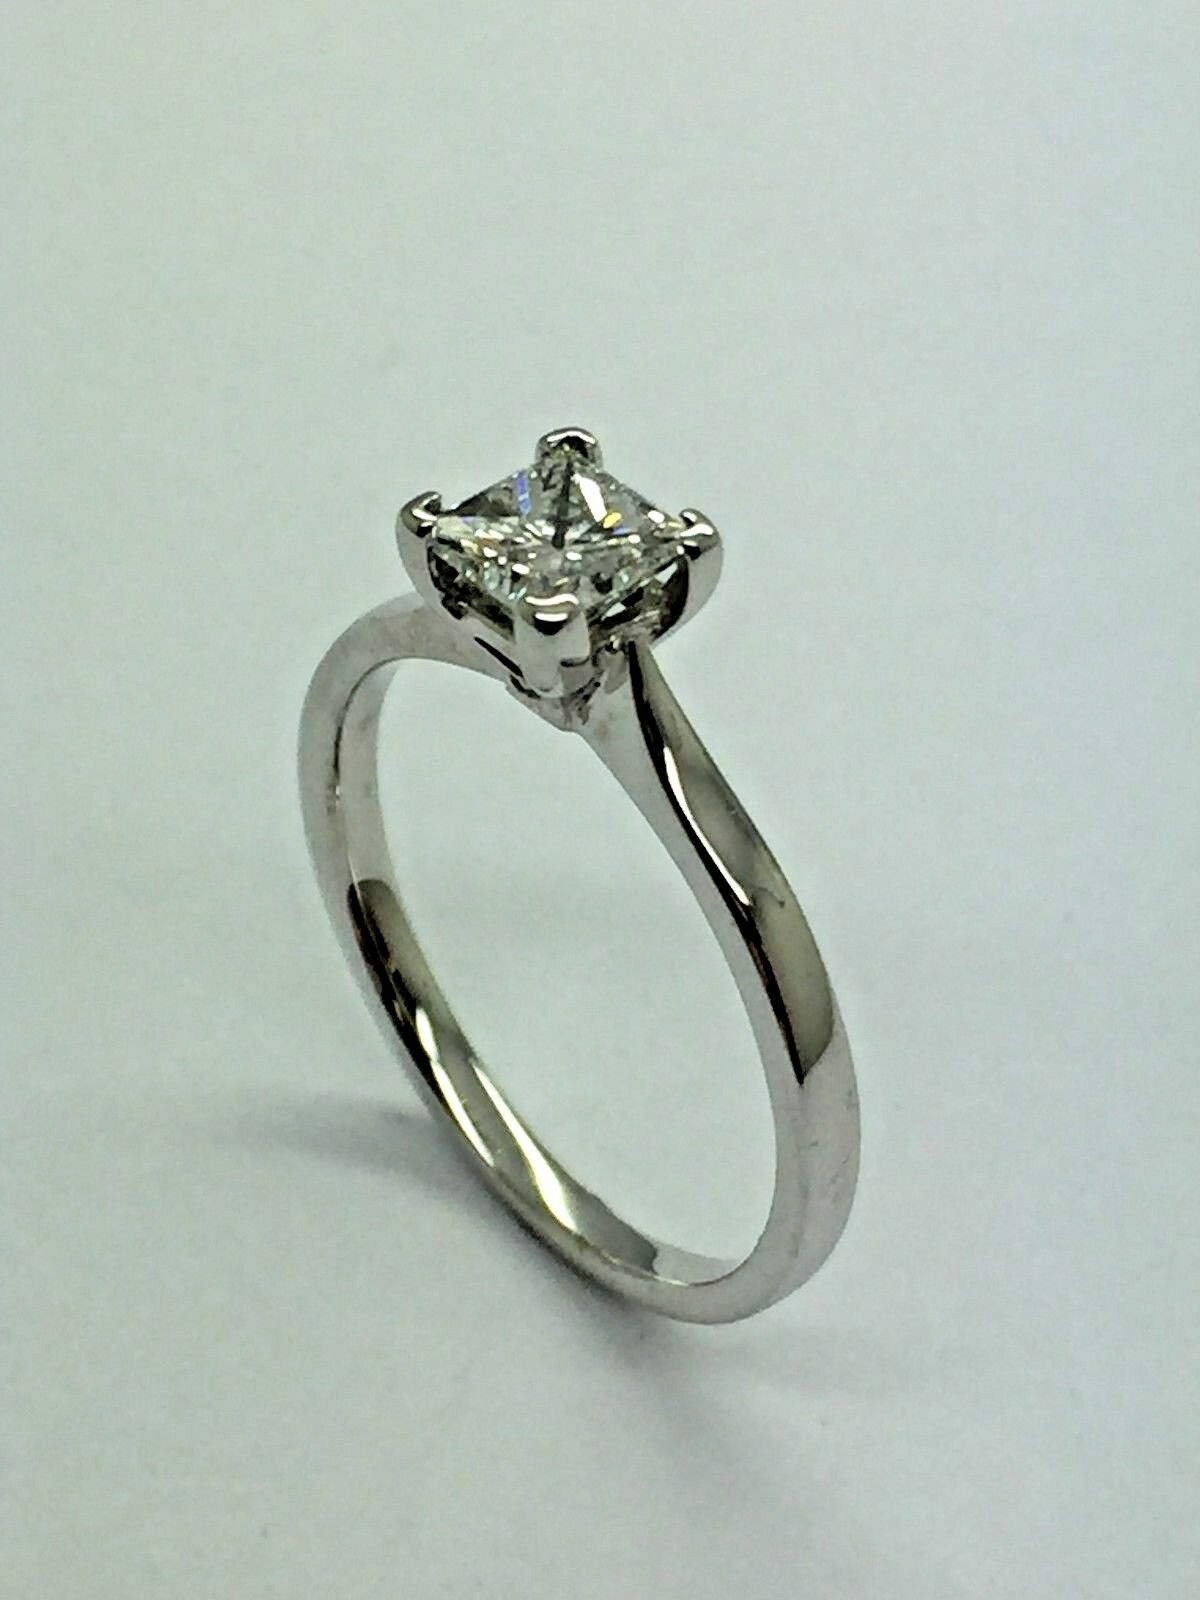 18ct White gold Princess Cut Diamond Engagement Ring - 0.51ct